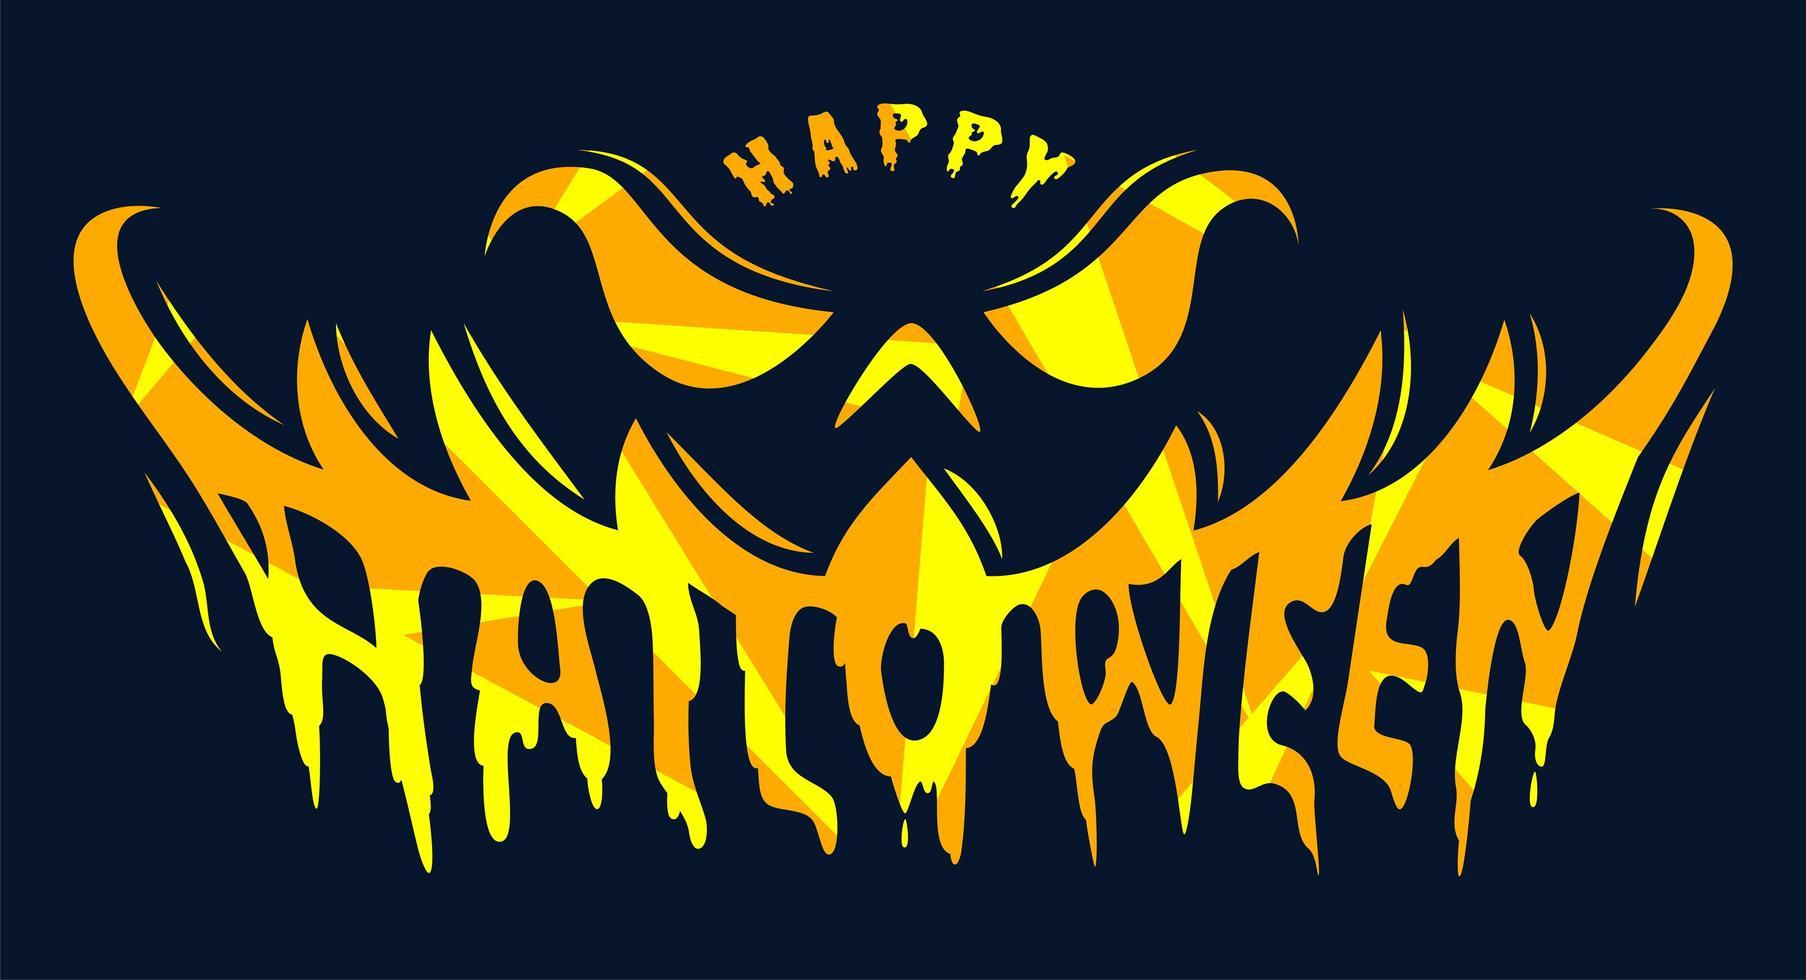 calabaza sonrisa feliz halloween texto vector